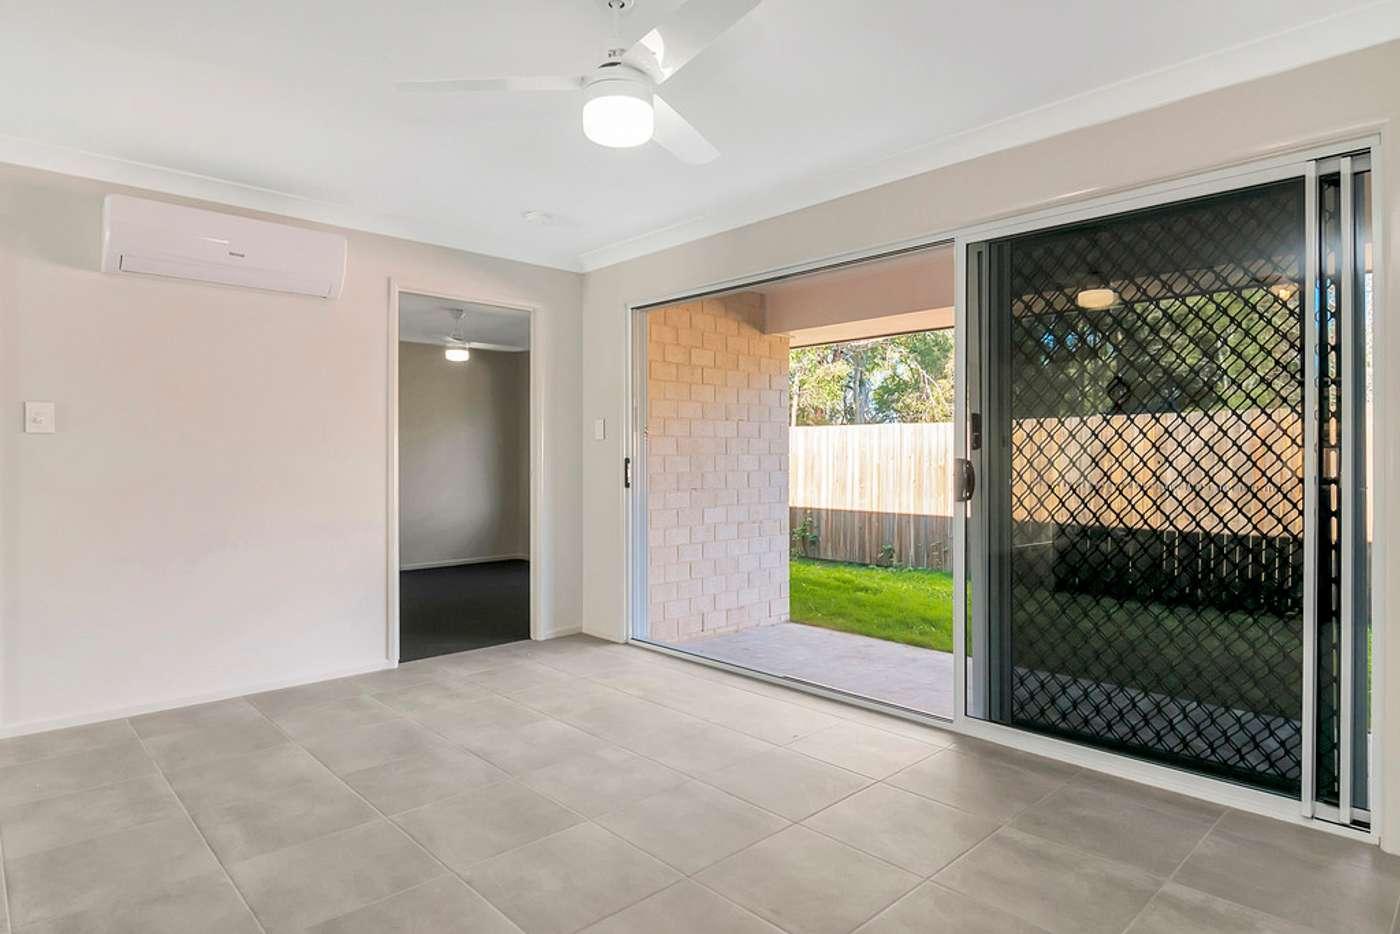 Sixth view of Homely house listing, 19 Macaranga Street, Marsden QLD 4132